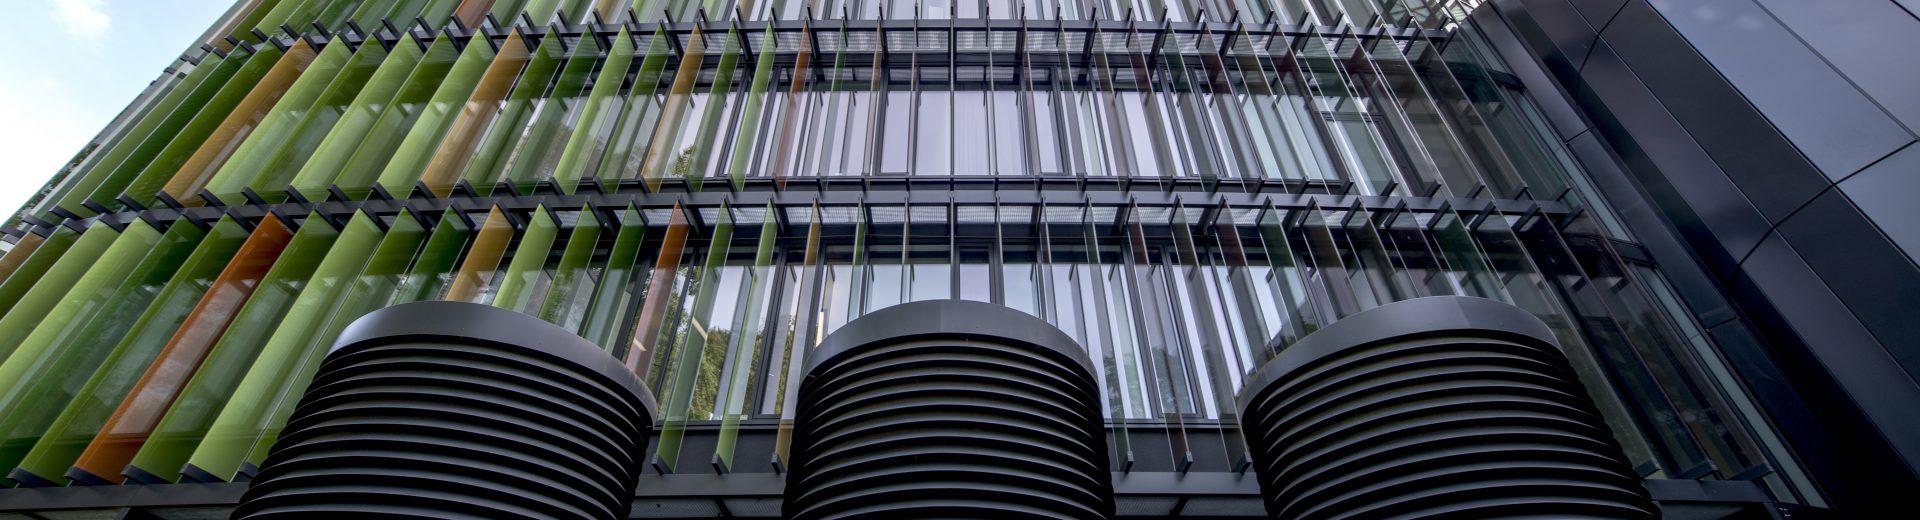 NR-Metallbau GmbH in Straelen